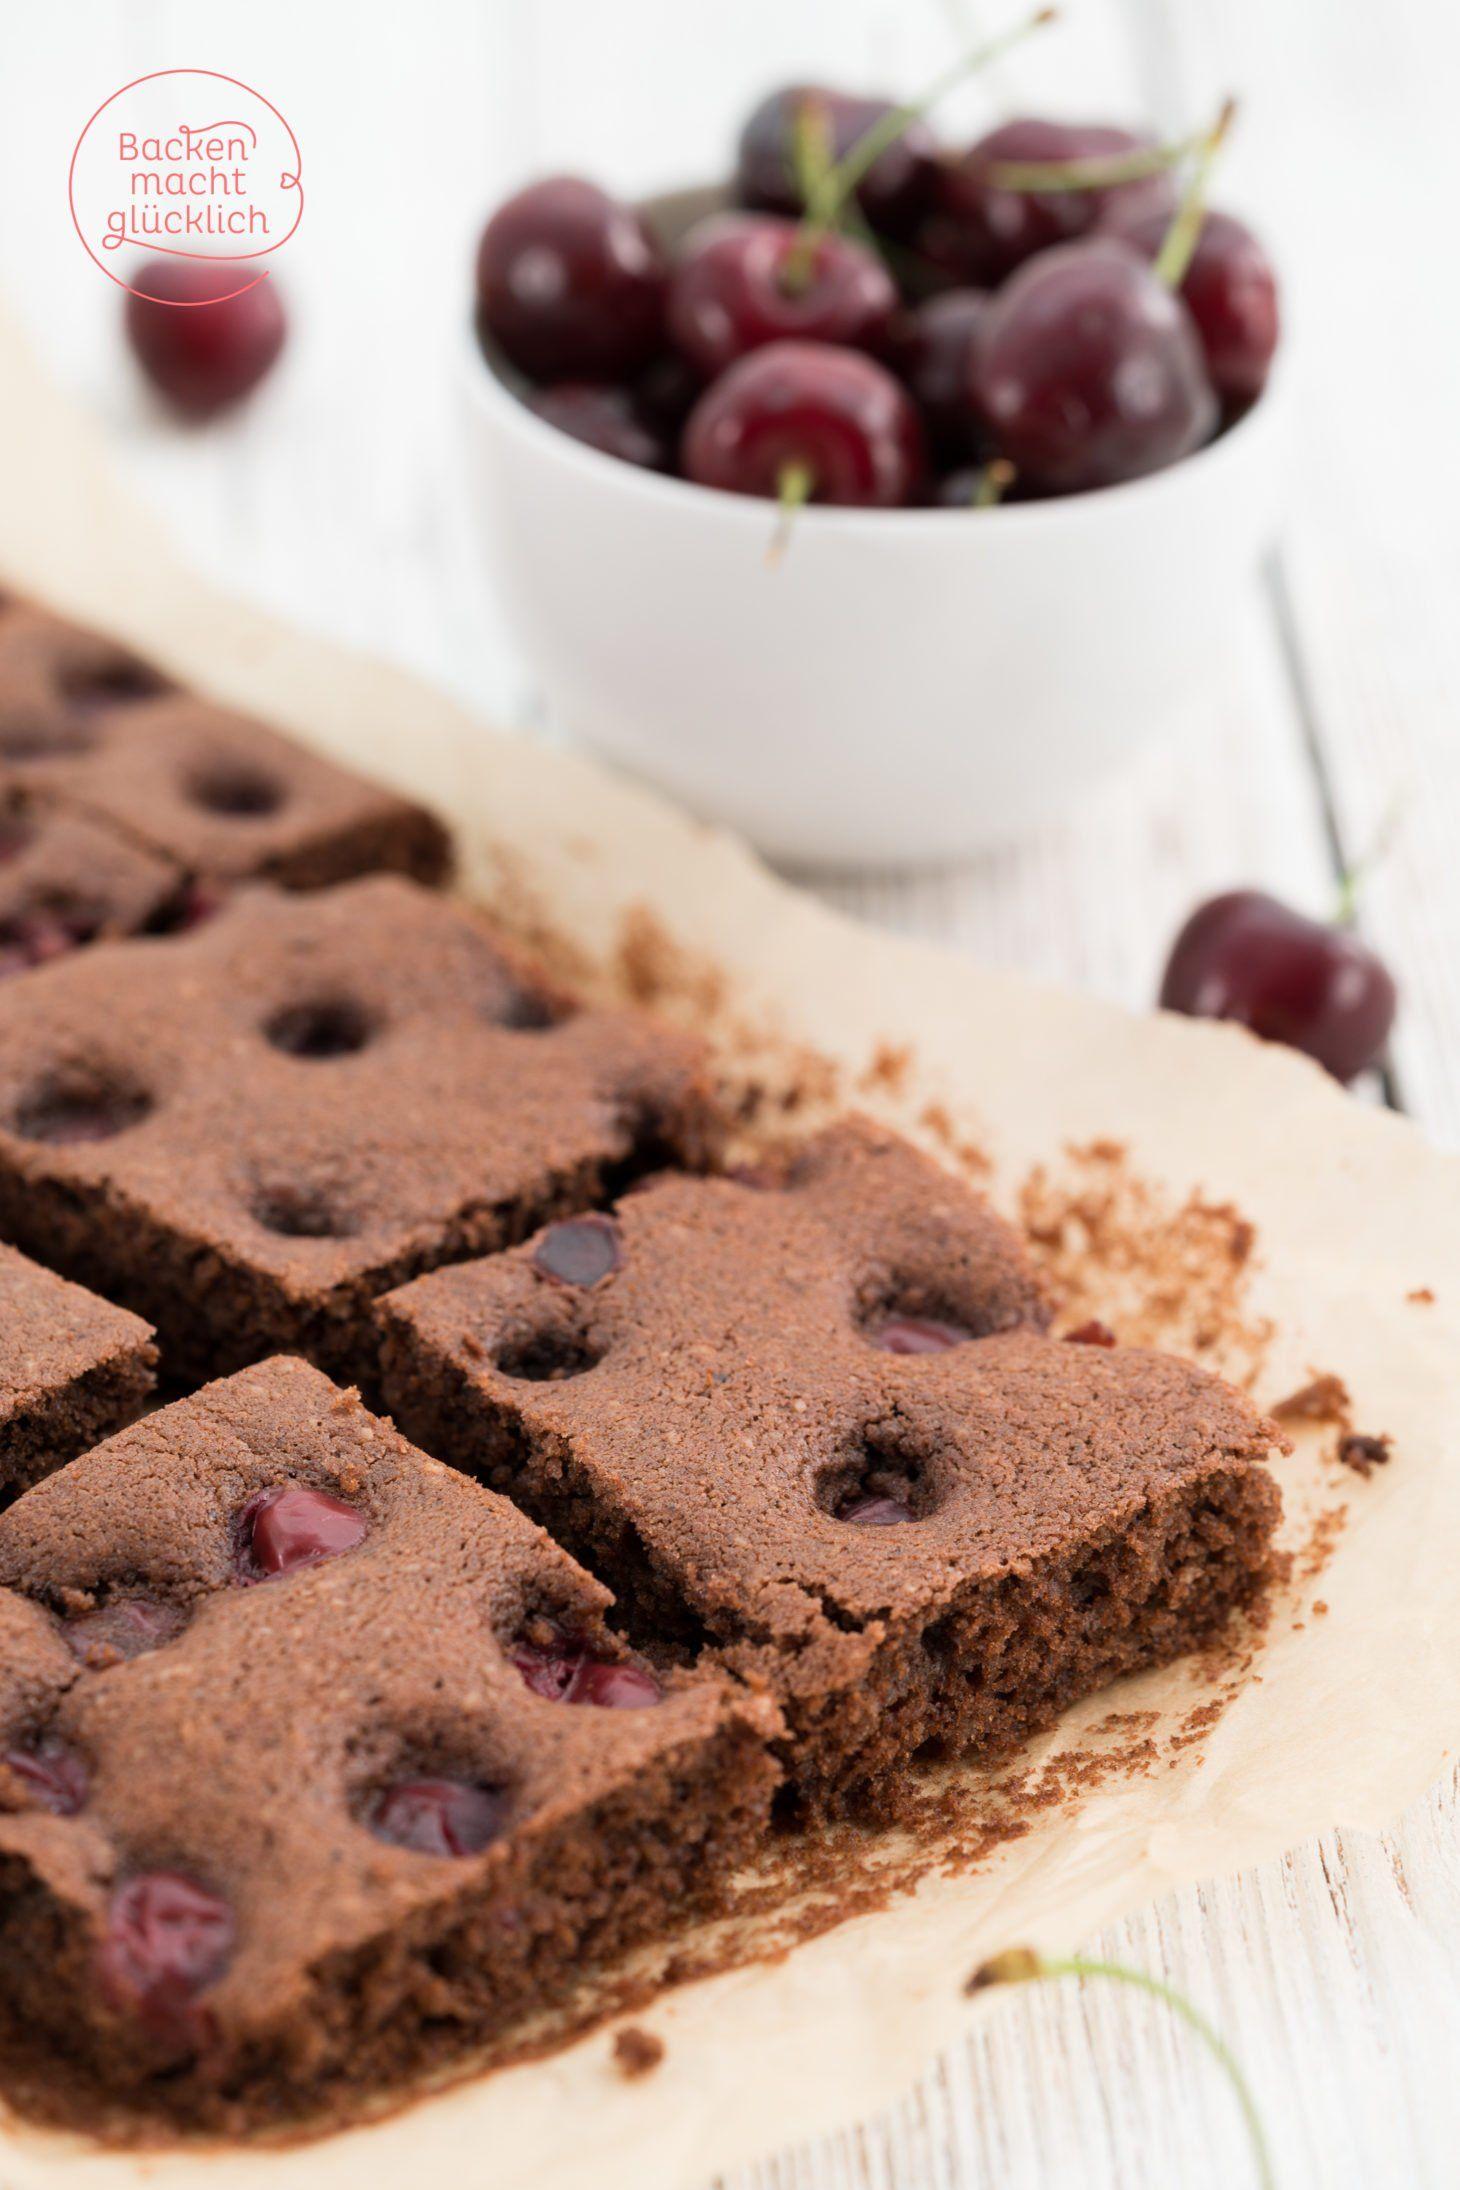 Saftiger Schoko Kirsch Kuchen Rezept Saftiger Schoko Kirsch Kuchen Schoko Kirsch Kuchen Schokoladen Kuchen